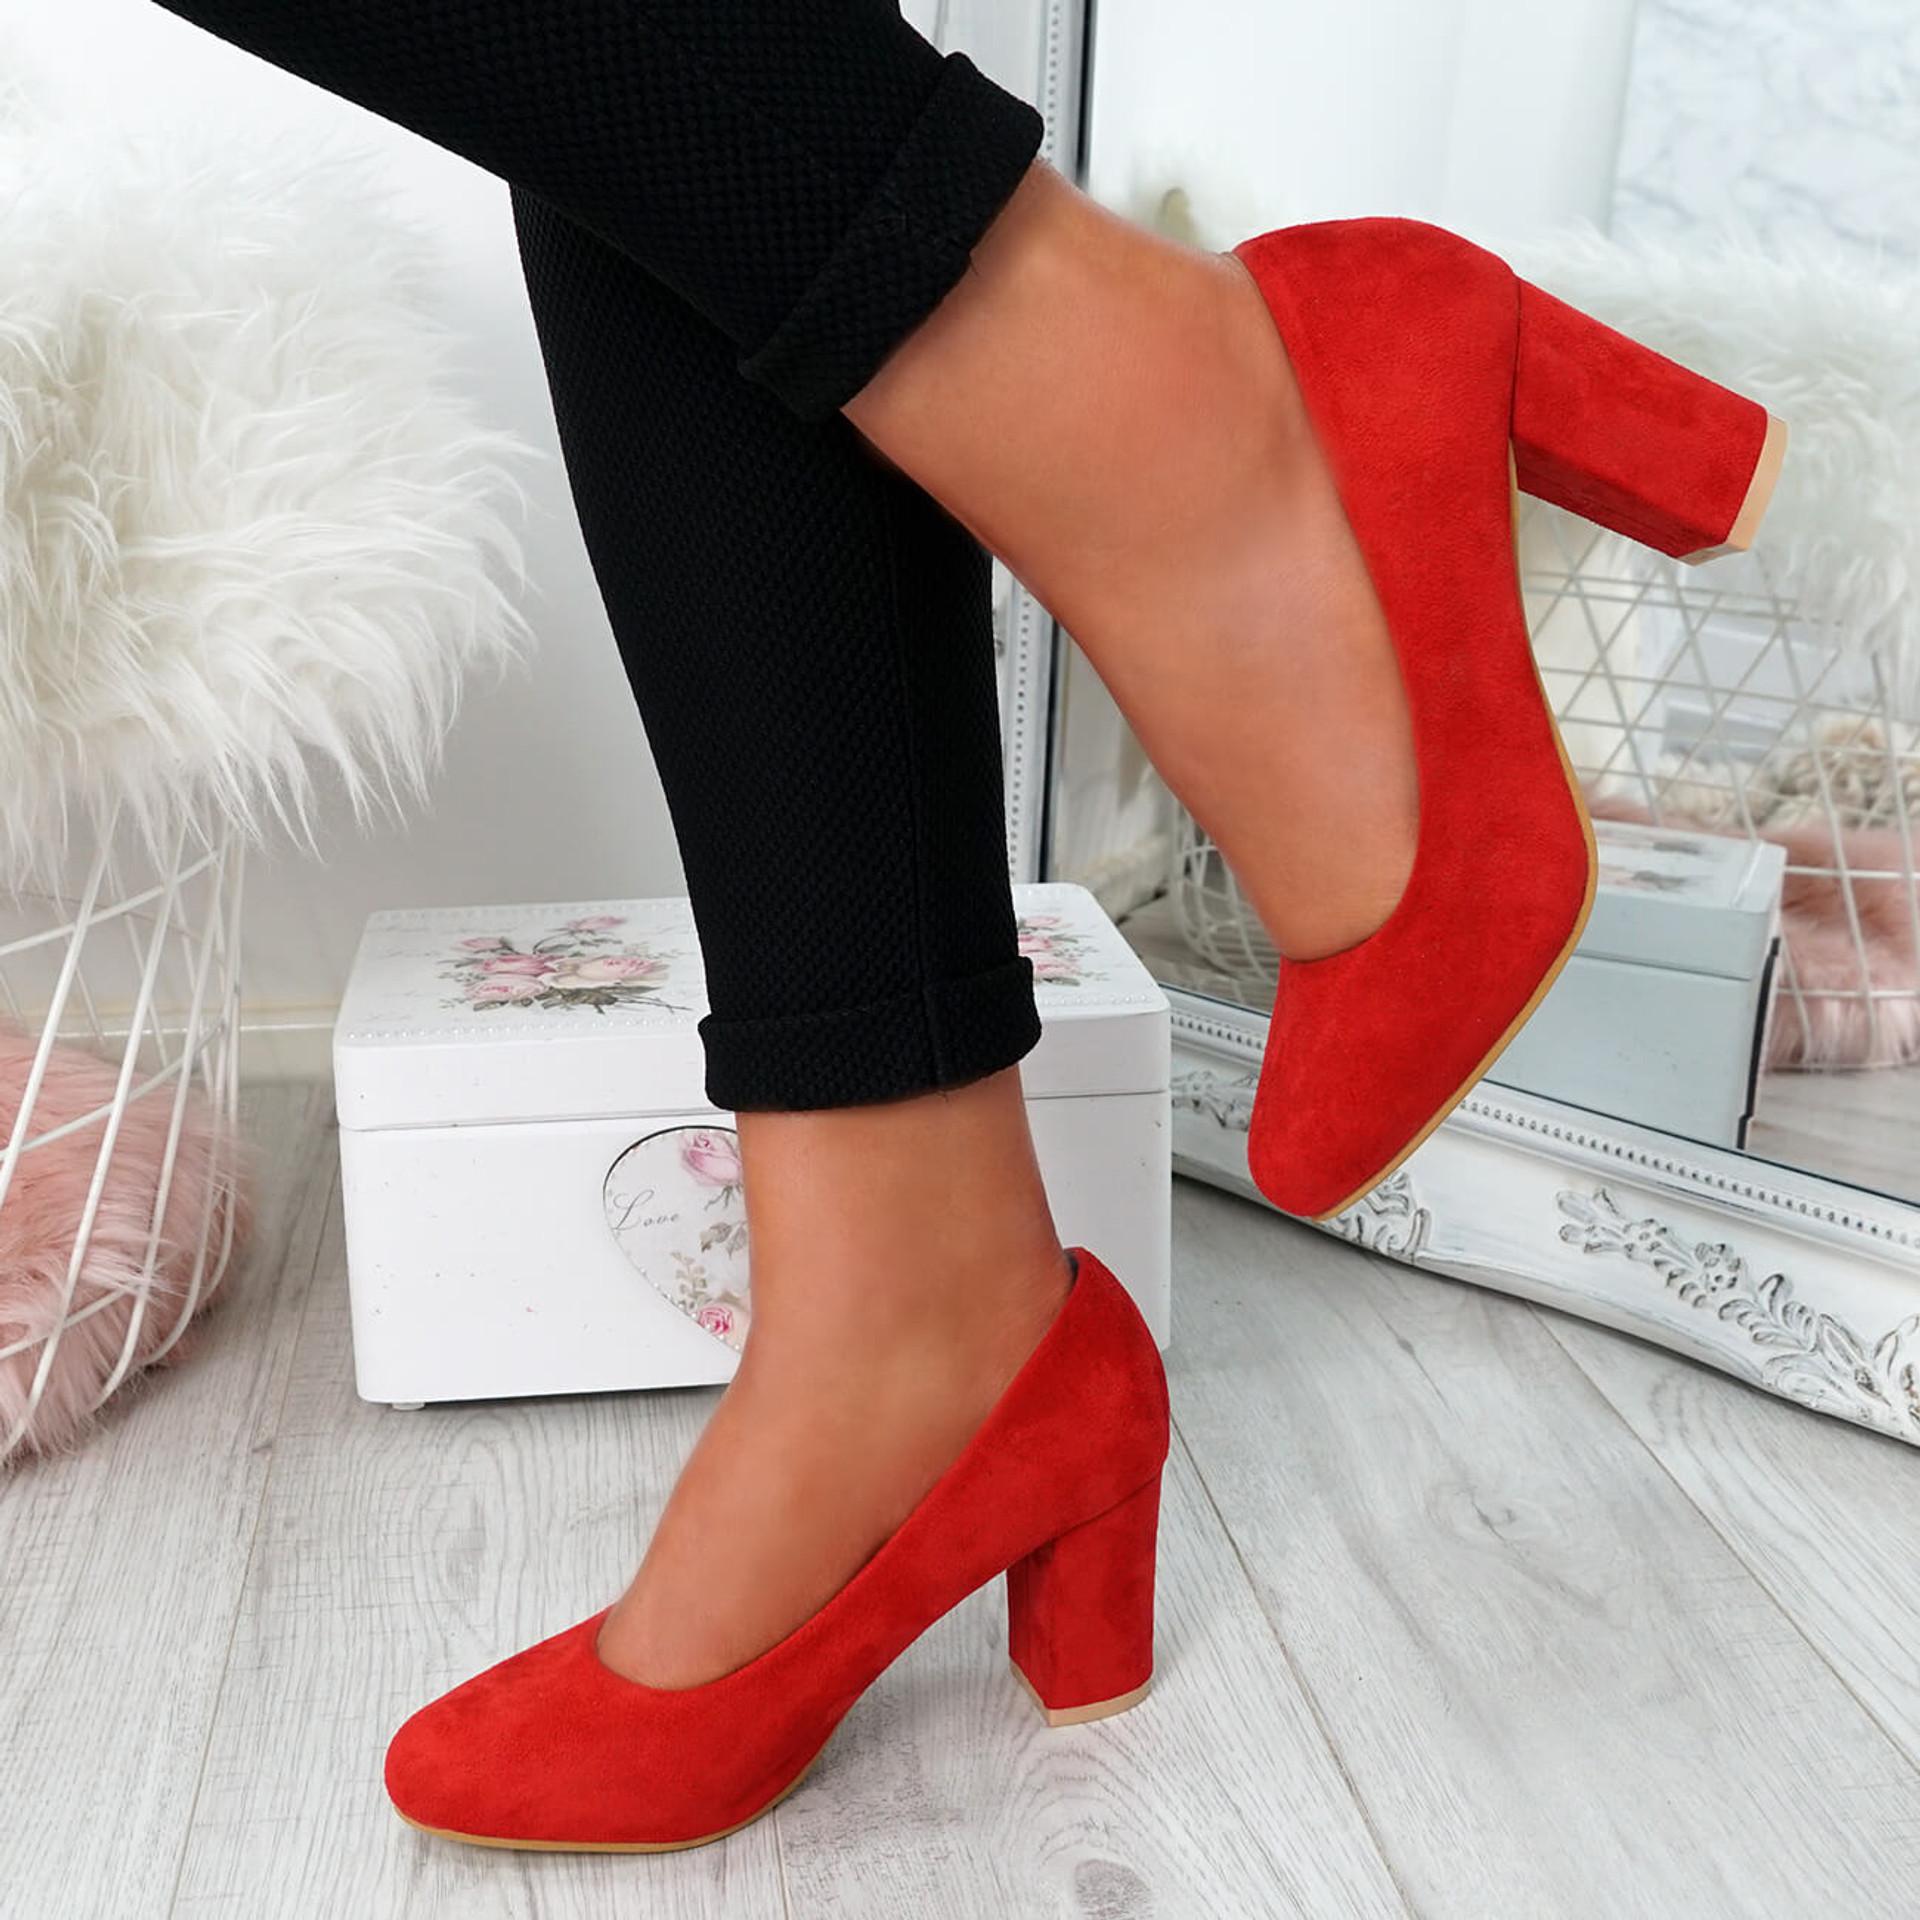 Novia Red Slip On Court Pumps